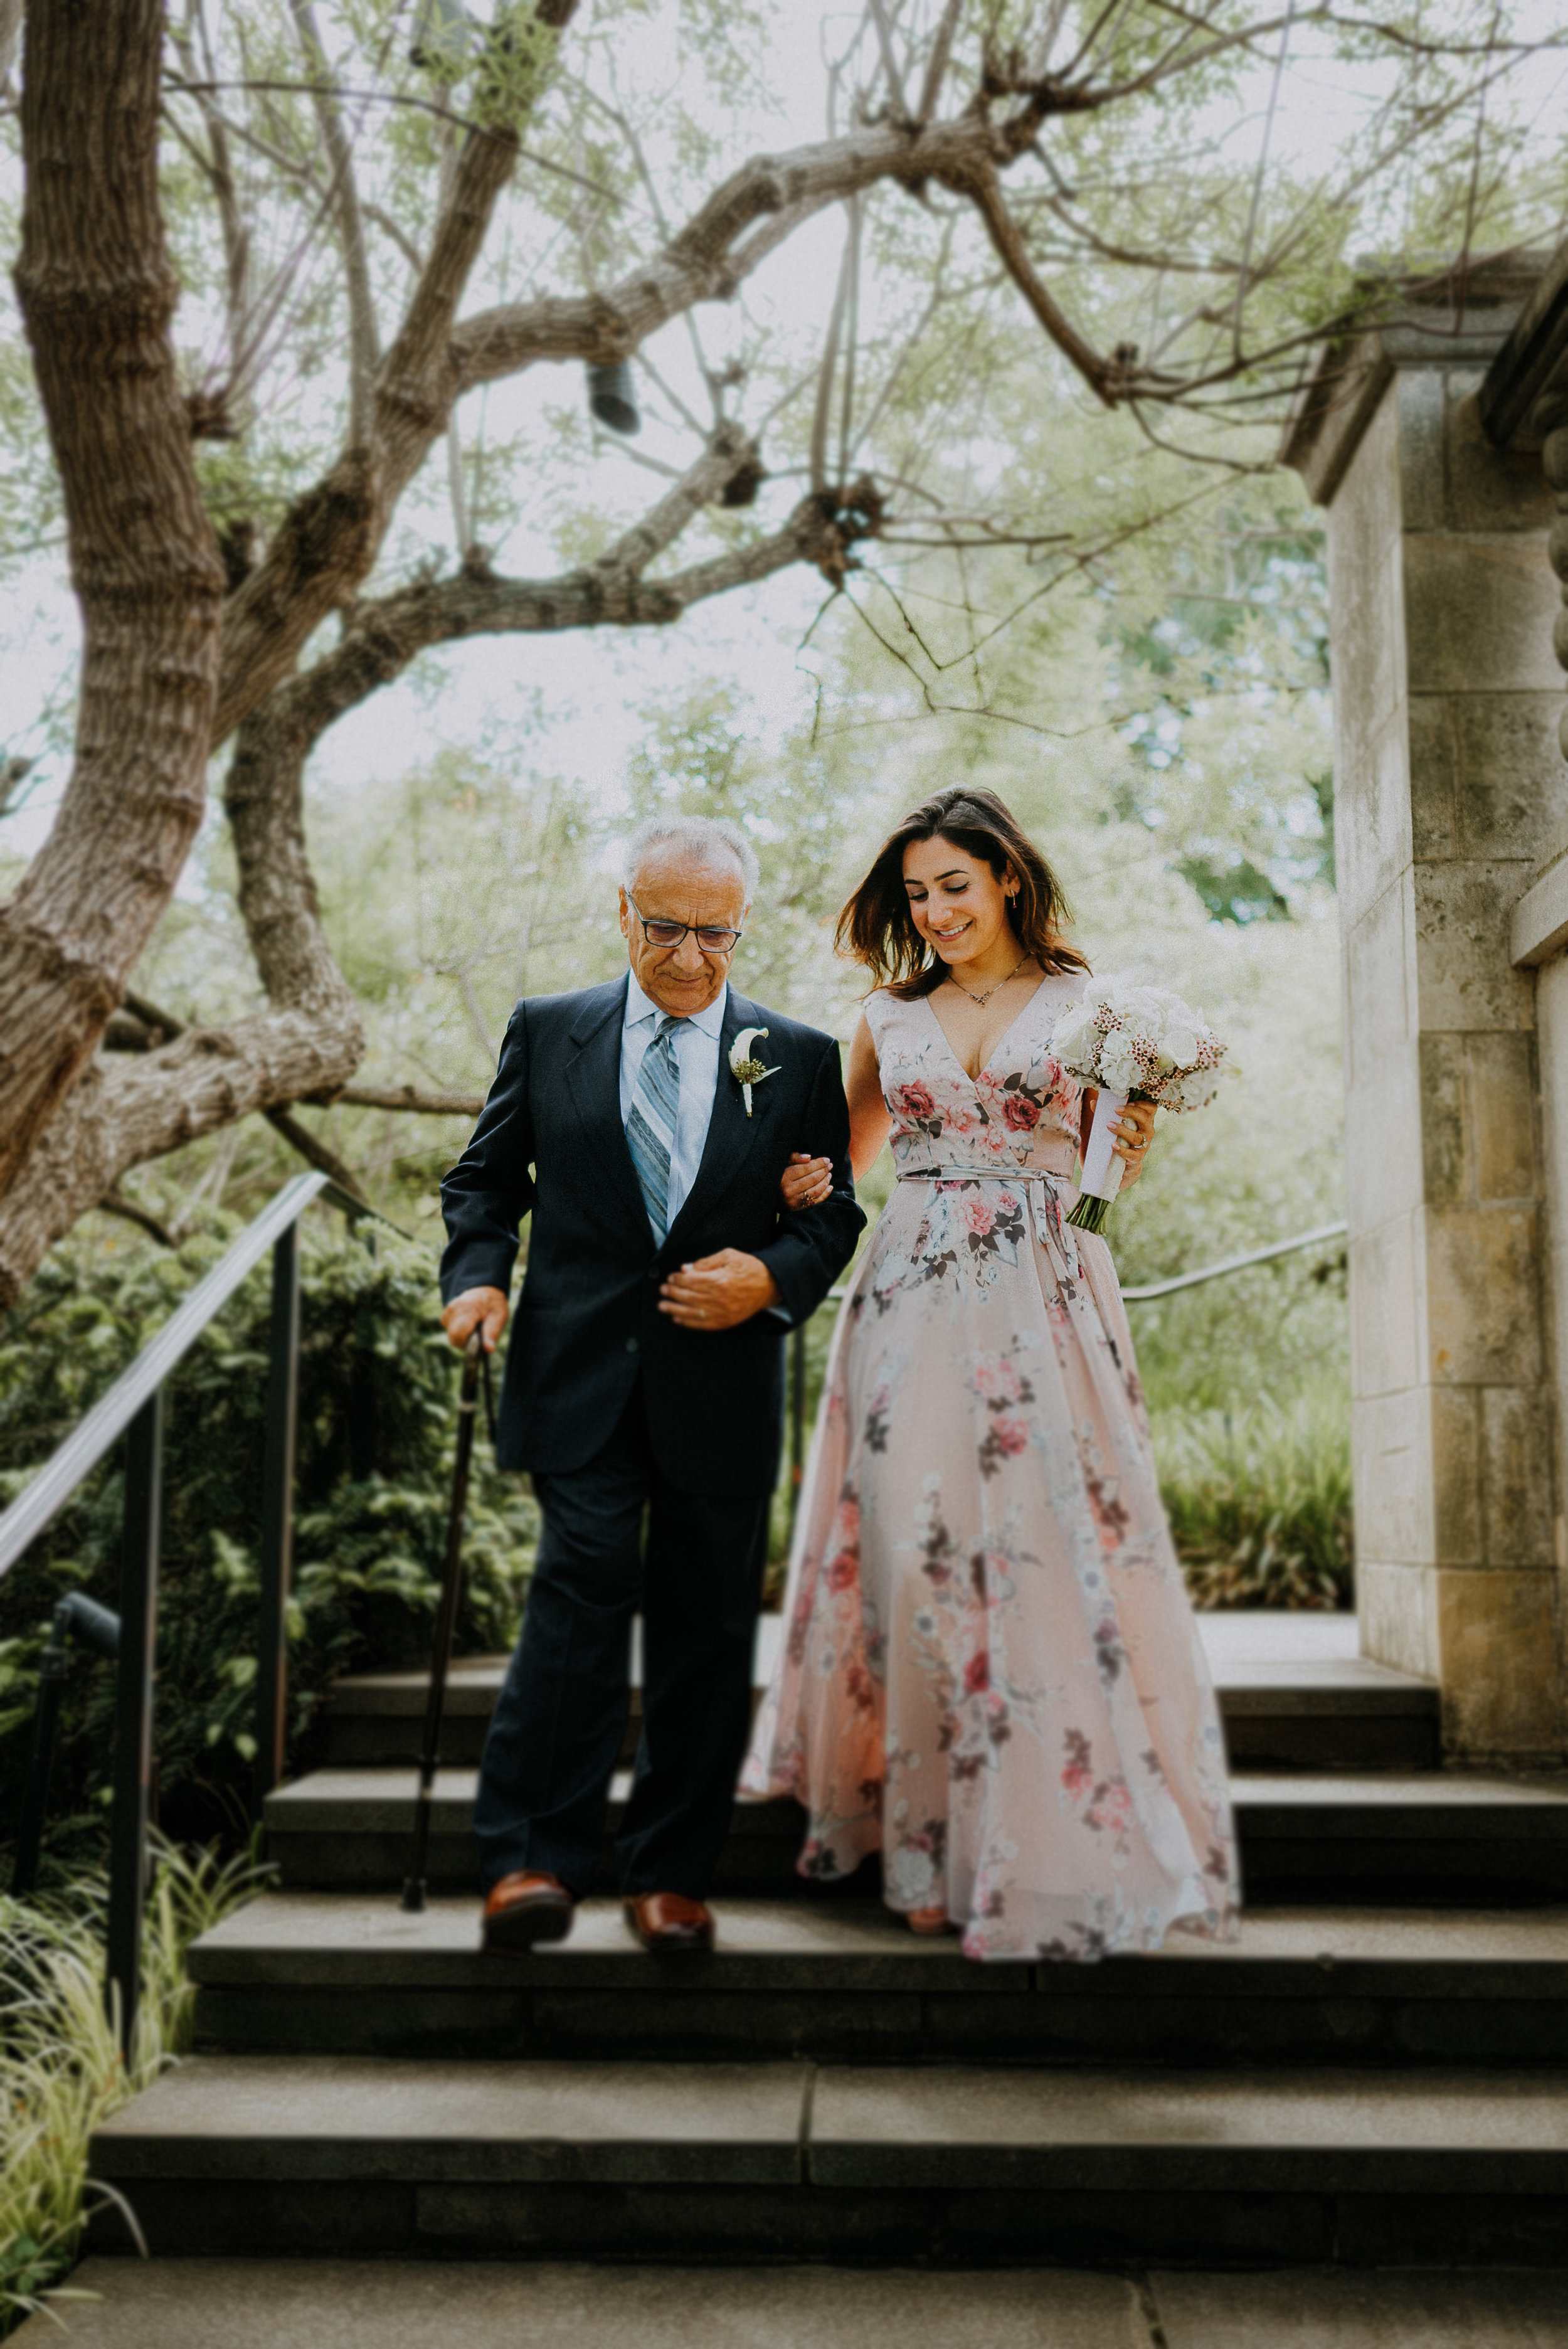 Dallas-fort-worth-wedding-photographer-dallas-arboretum-intimate-wedding-dallas-texas-05